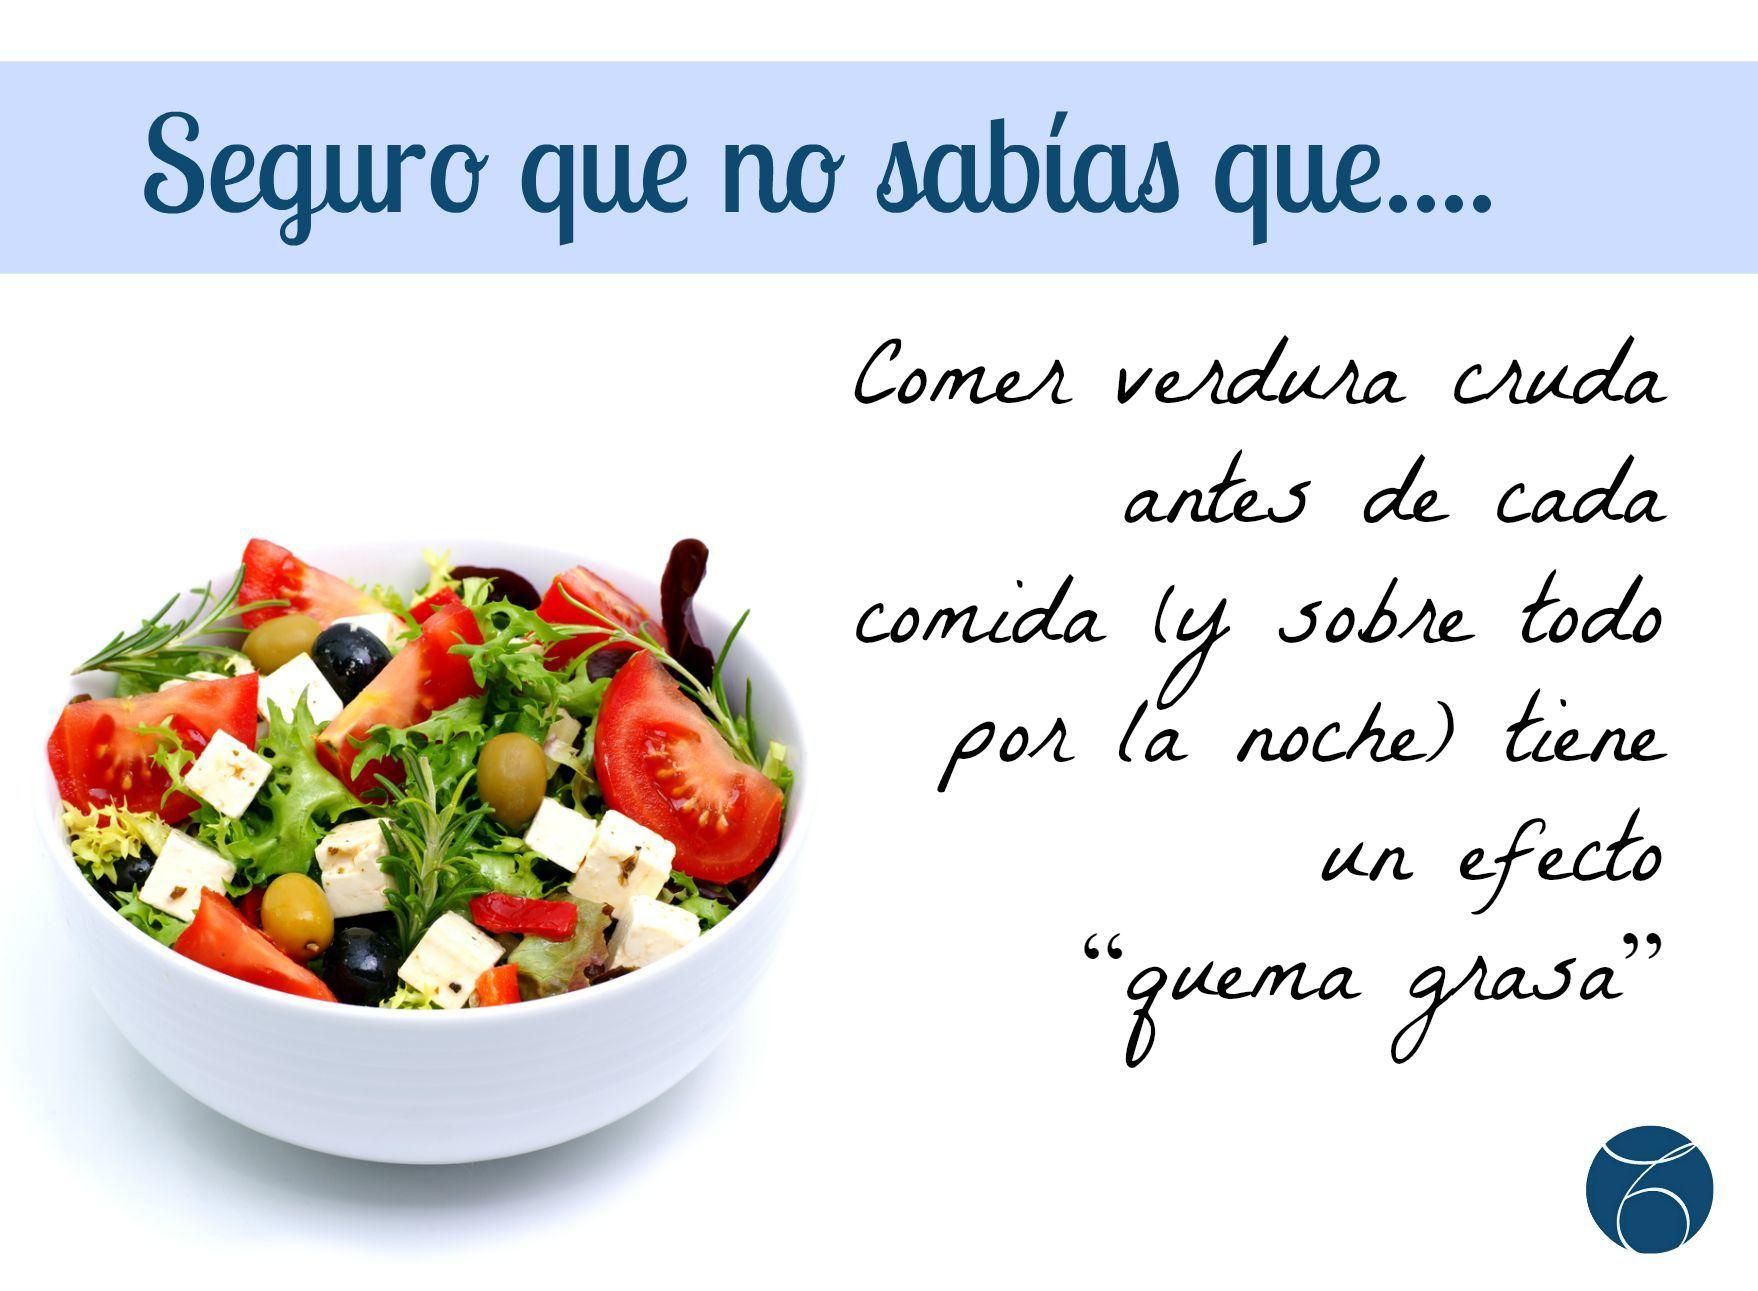 Sab As Que Comer Verdura Cruda Como Primer Plato Tiene Un Efecto  ~ Como Adelgazar Comiendo De Todo